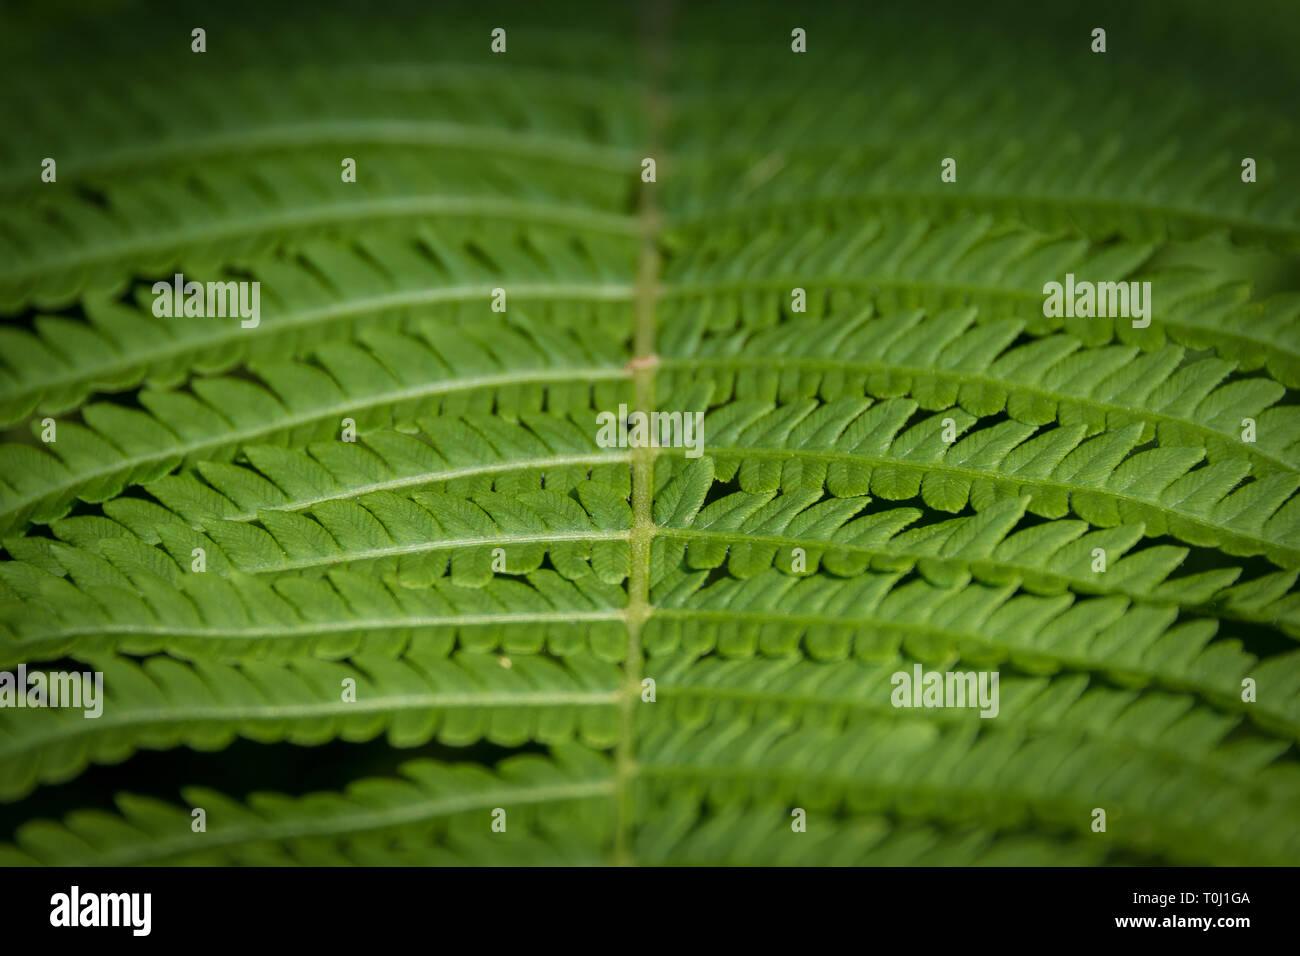 Ferns at Kew Royal Botanic Gardens, London, United Kingdom Stock Photo